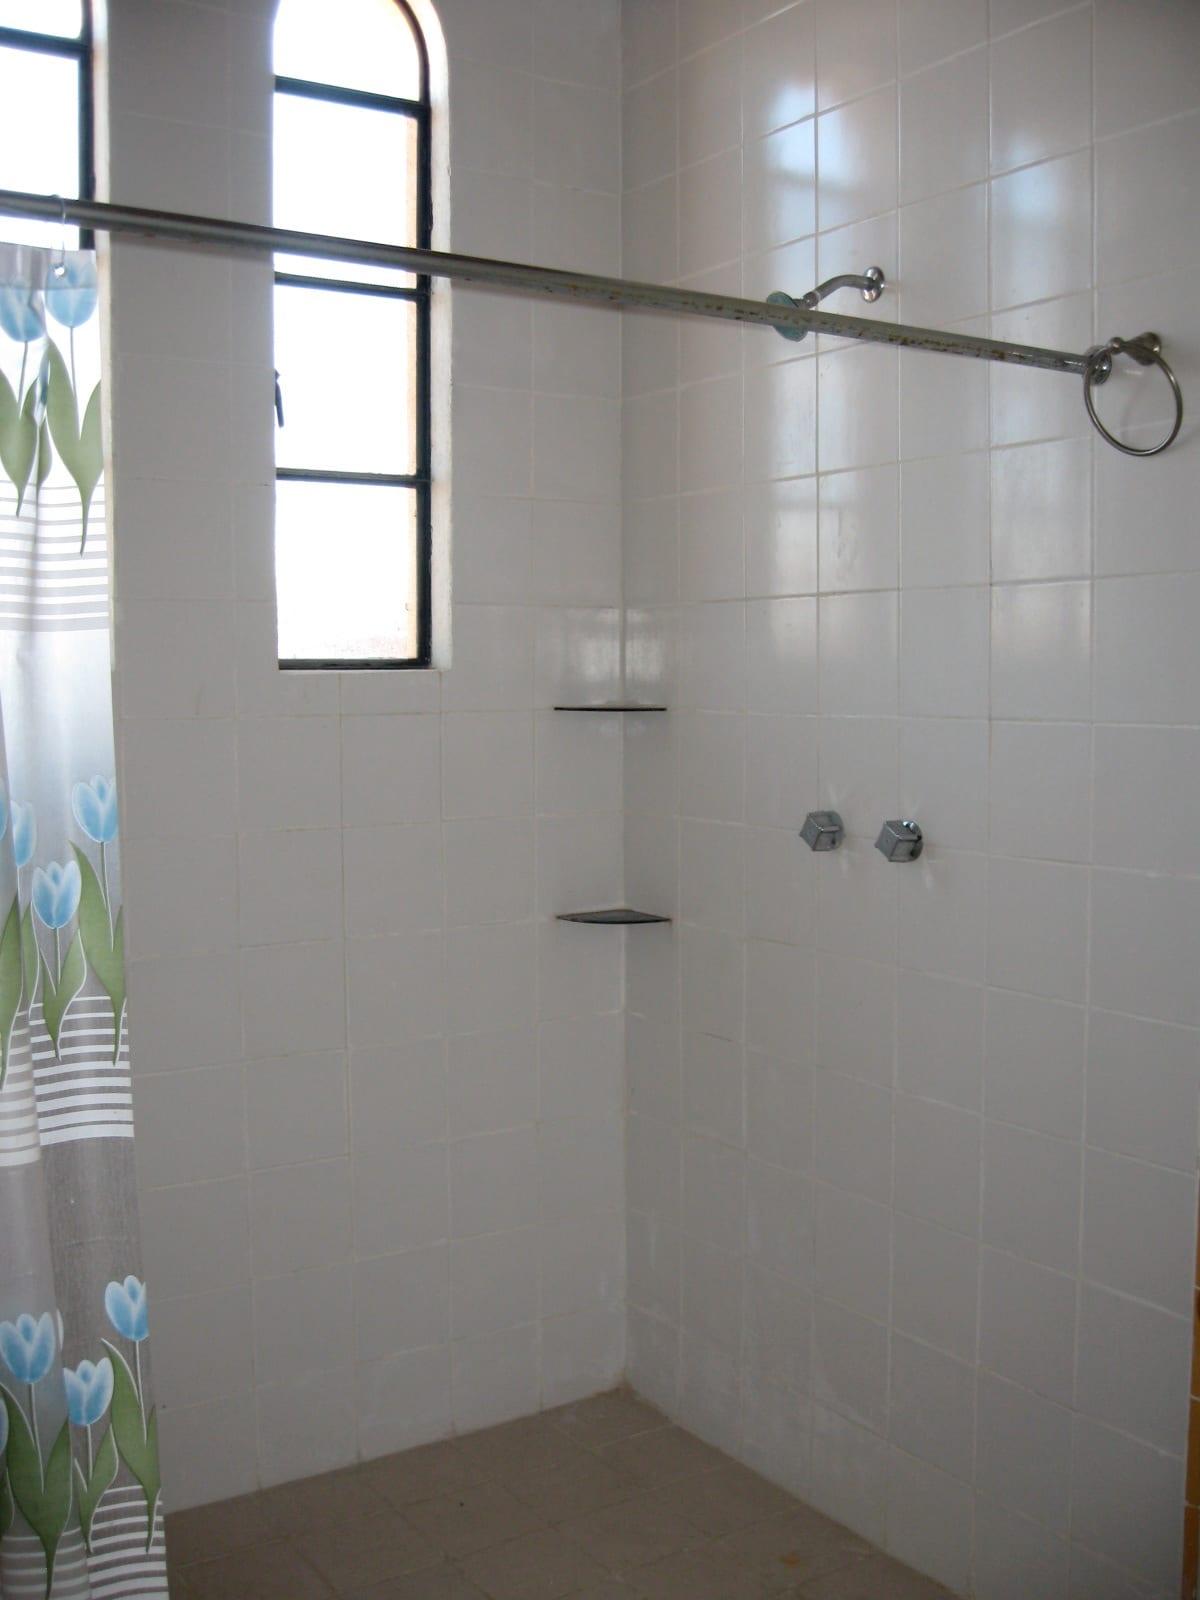 Your en suite bathroom has a large walk-in shower!